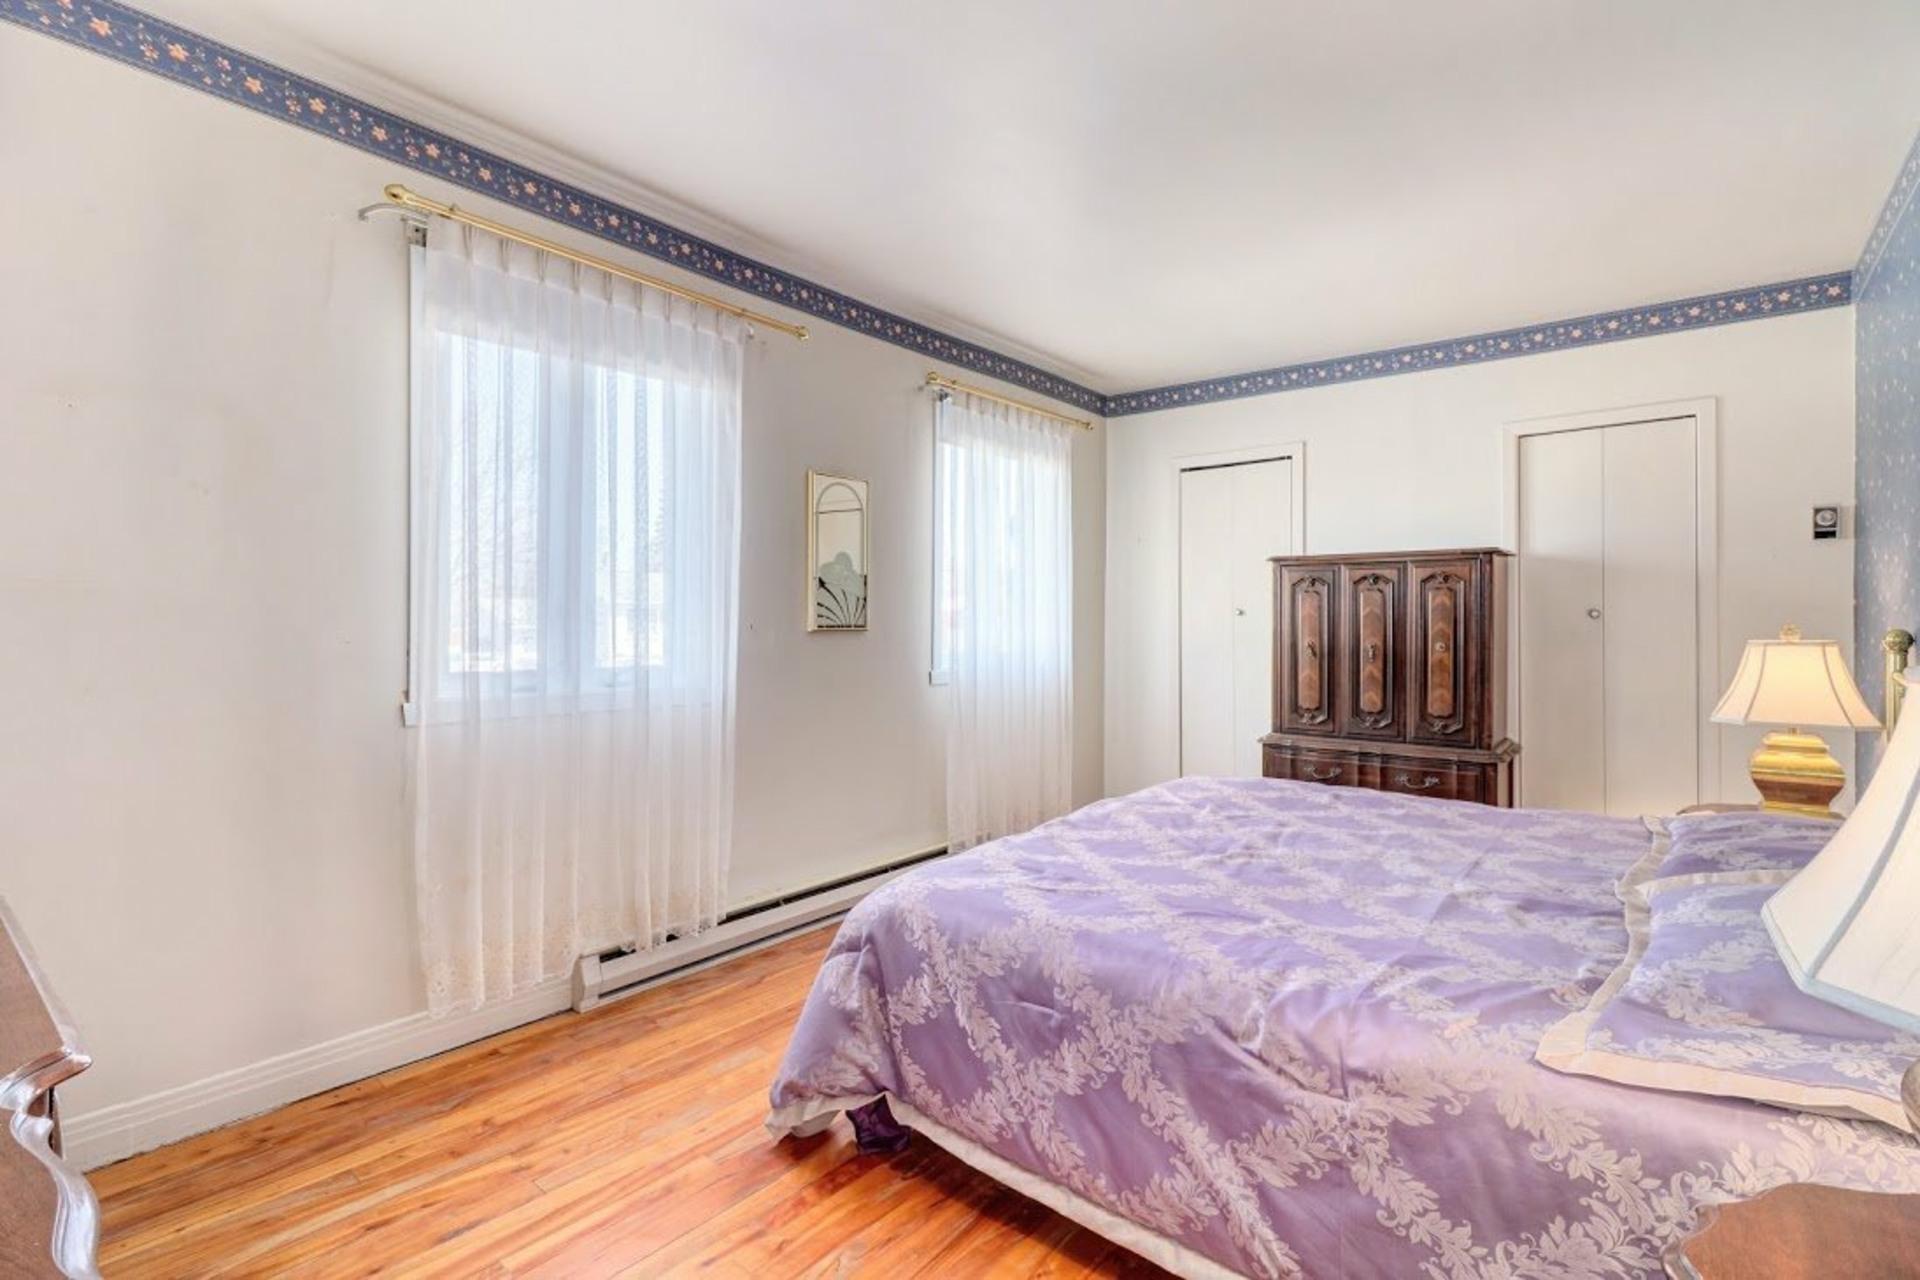 image 15 - House For sale Notre-Dame-des-Prairies - 9 rooms